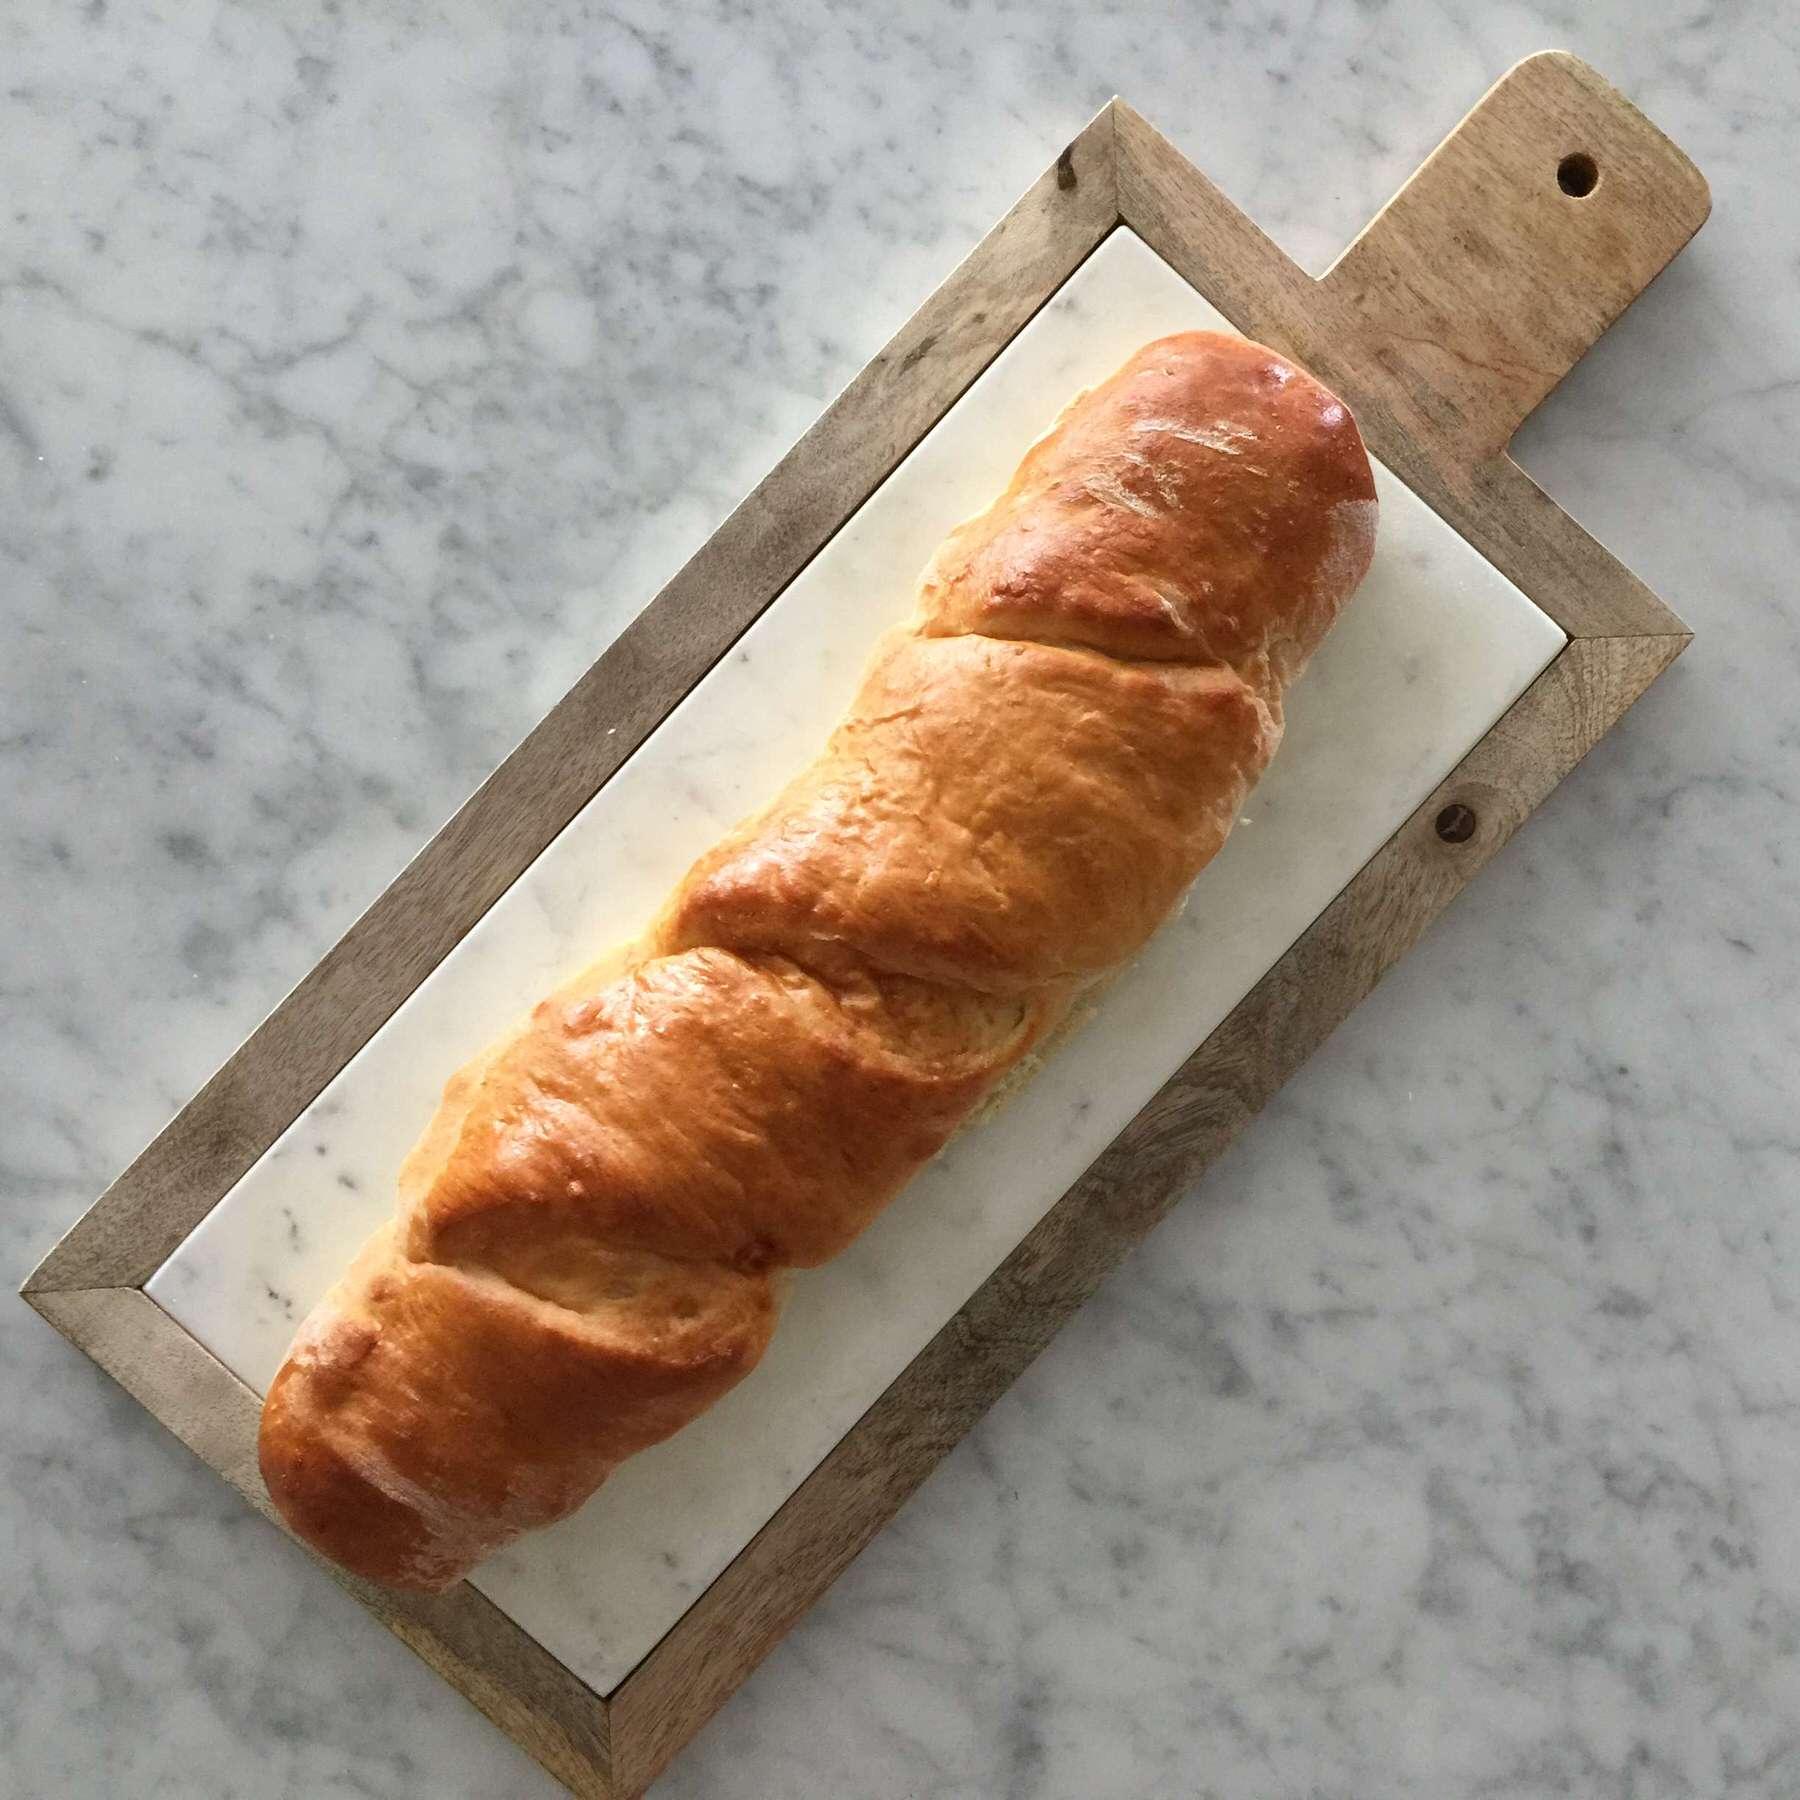 Diane S No Fail French Bread A Bountiful Kitchen